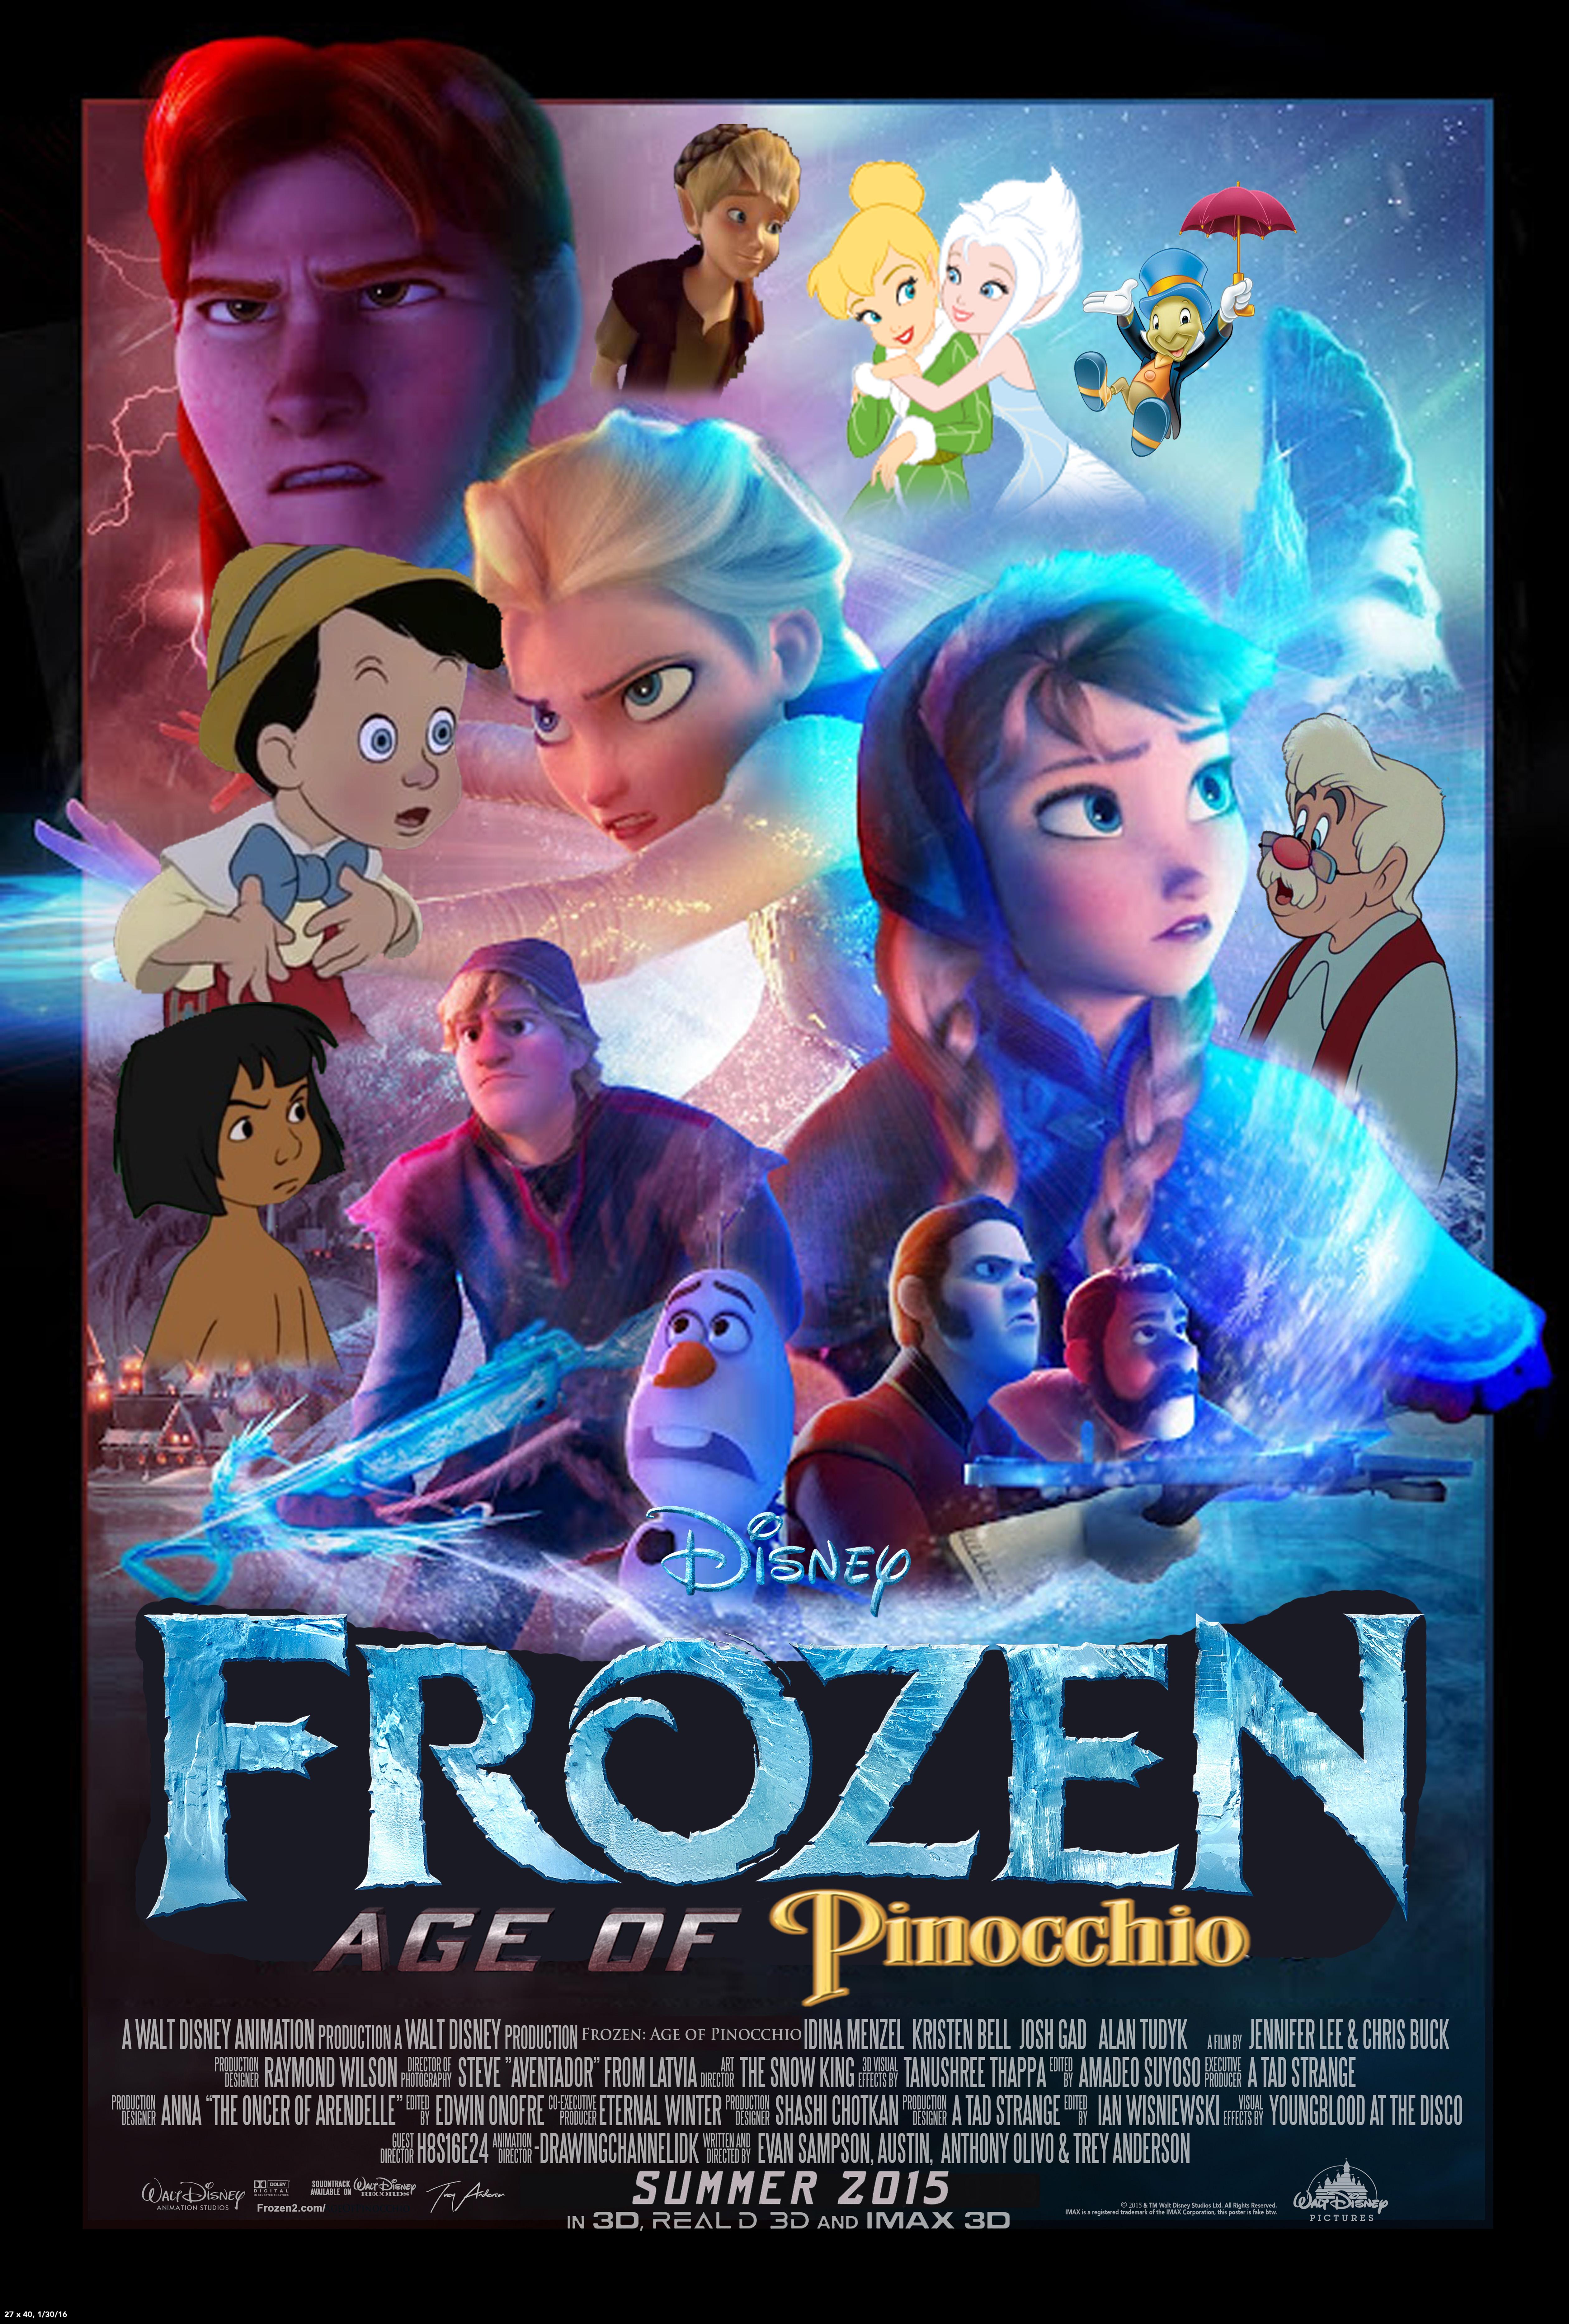 Disney's Frozen: Age of Pinocchio Poster